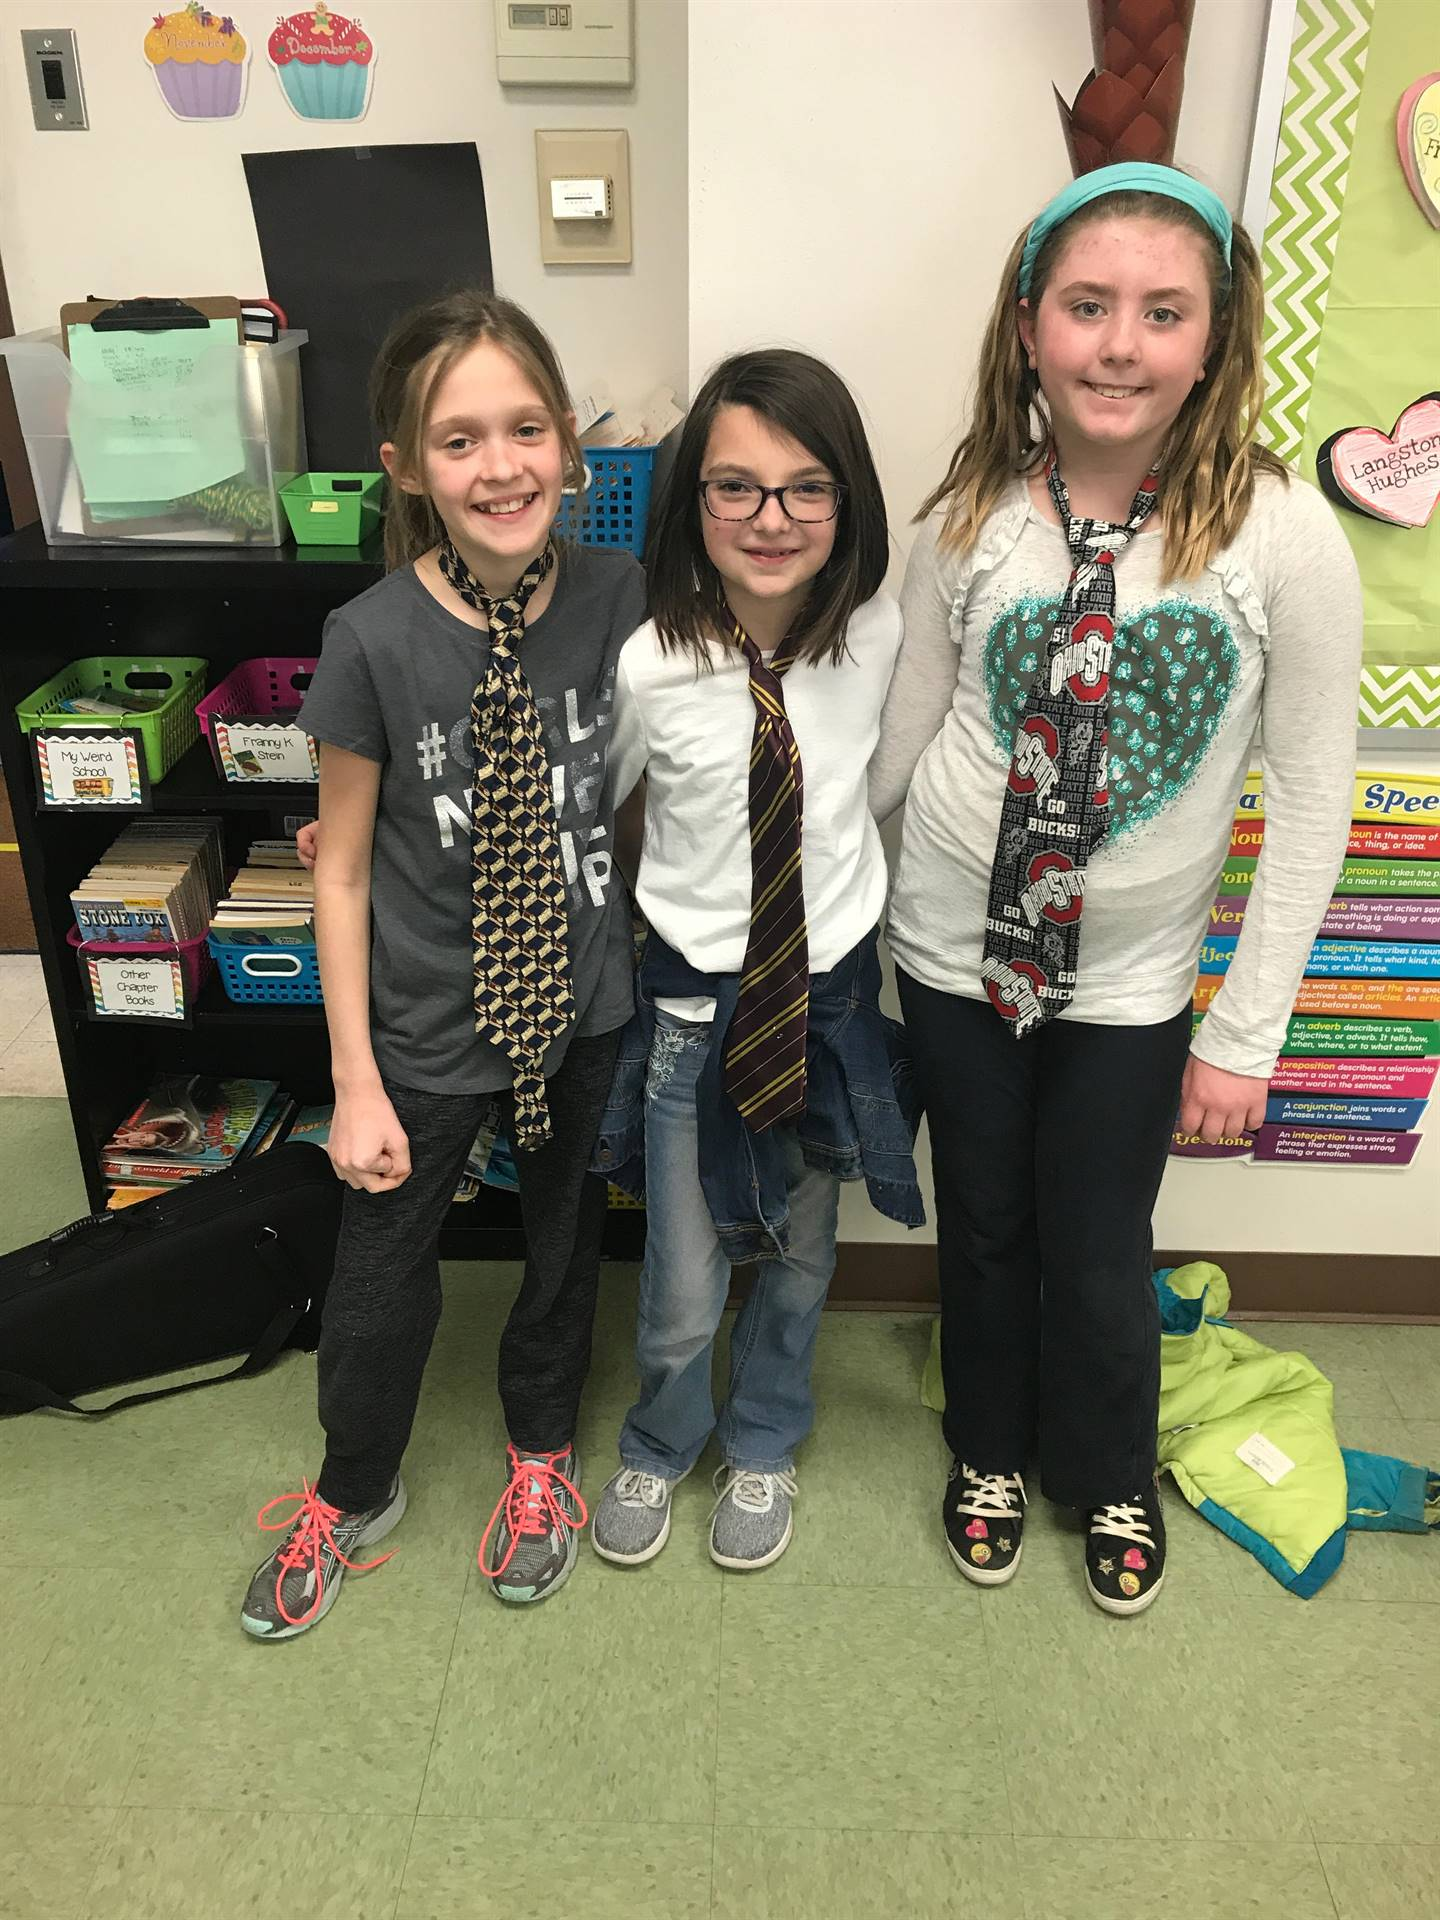 Girls Celebrating Ugly Tie Day for Spirit Week